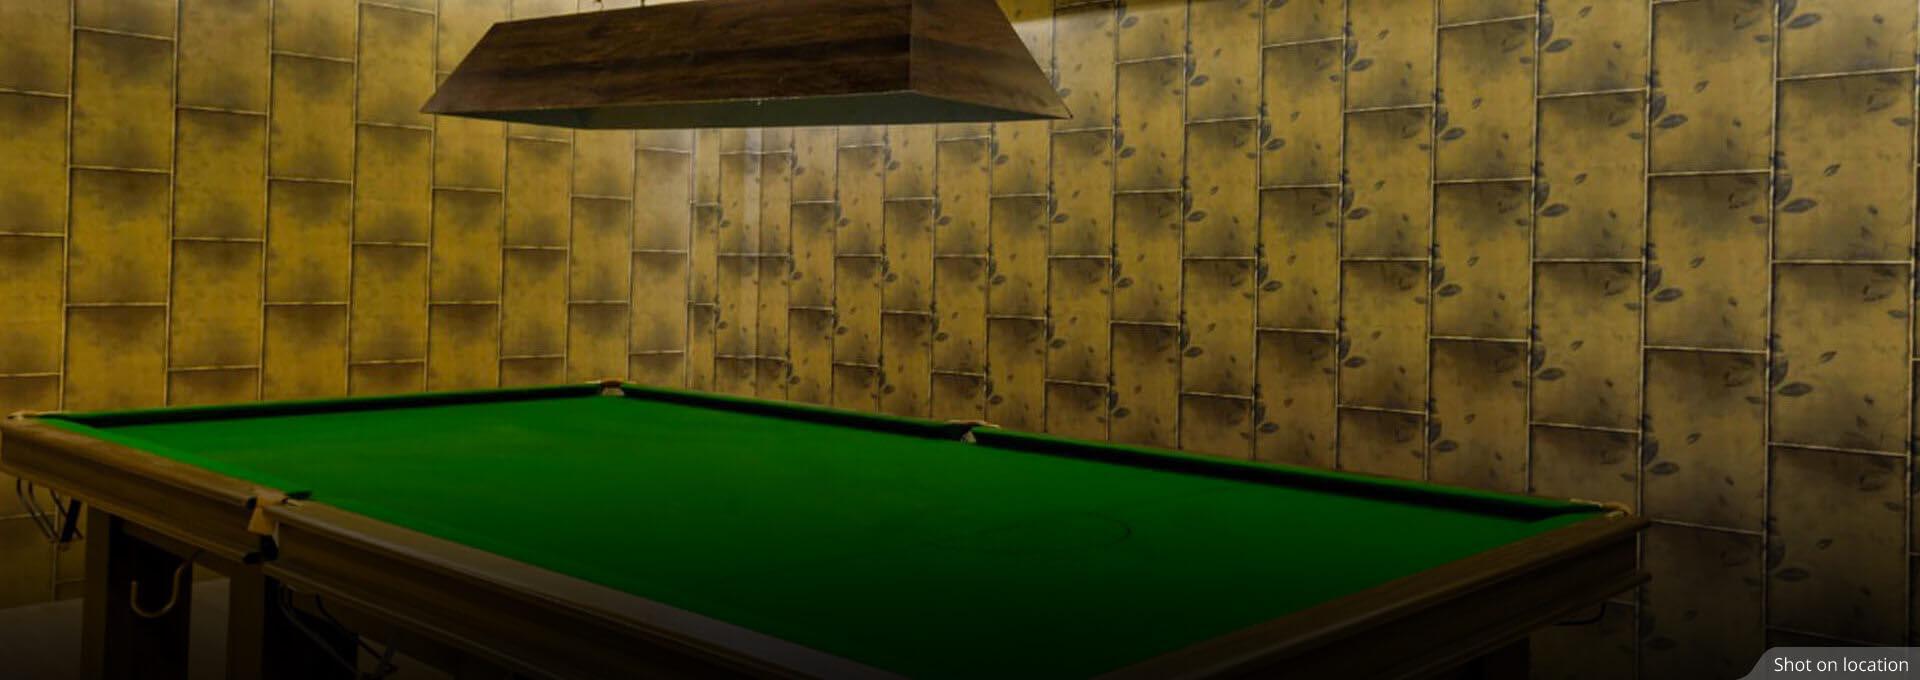 Billiards in Evita  by House of Hirandani in Bannerghatta, Bengaluru